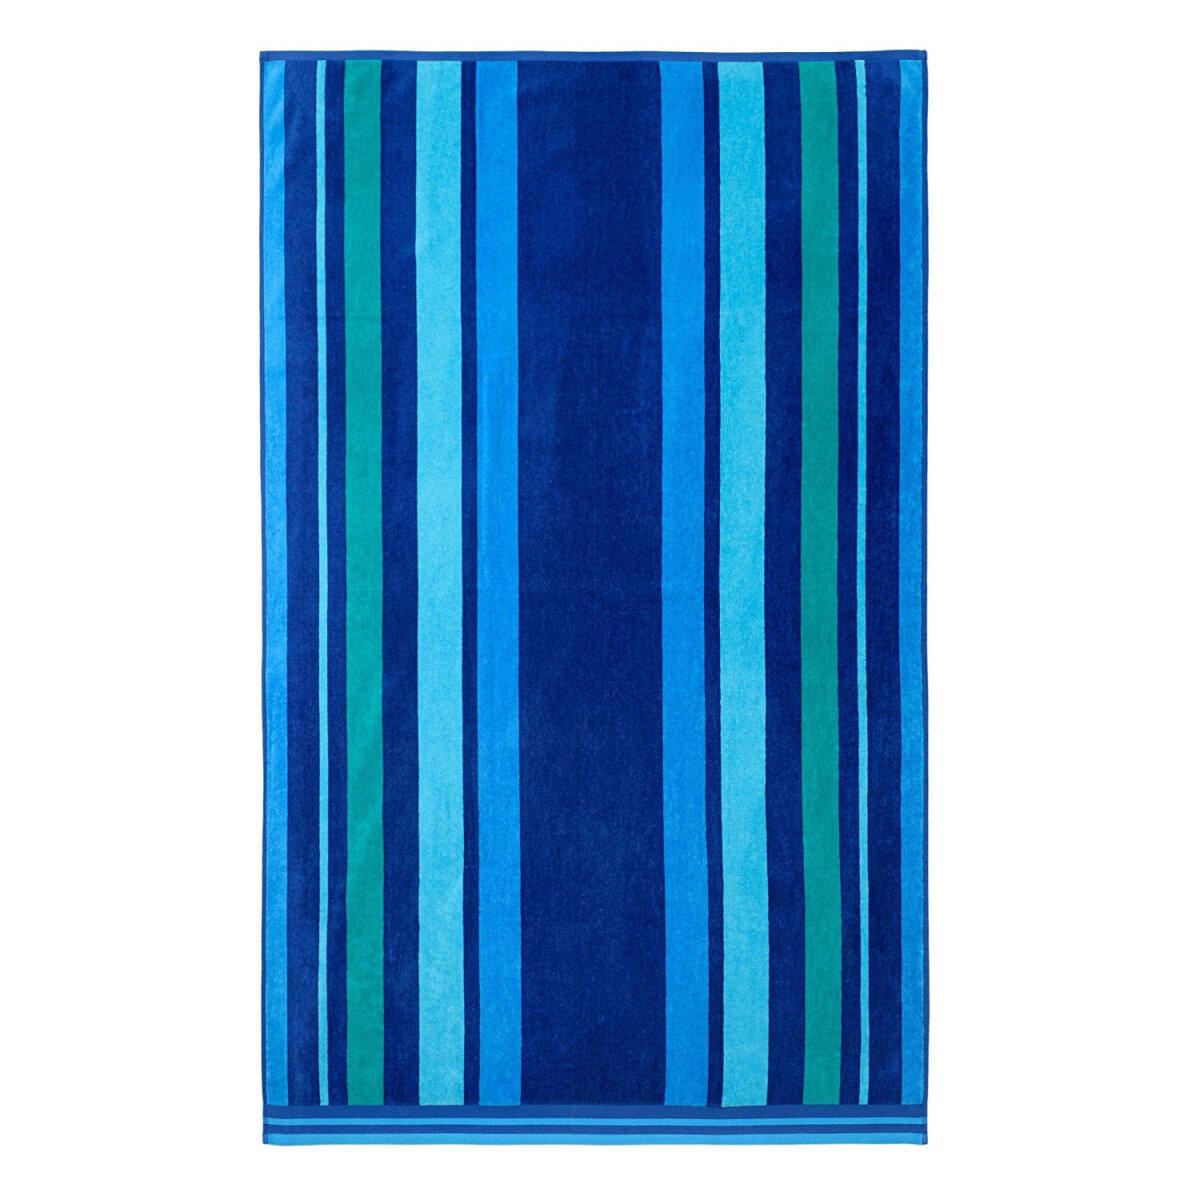 strandtuch velours jacquard streifen blau petrol. Black Bedroom Furniture Sets. Home Design Ideas